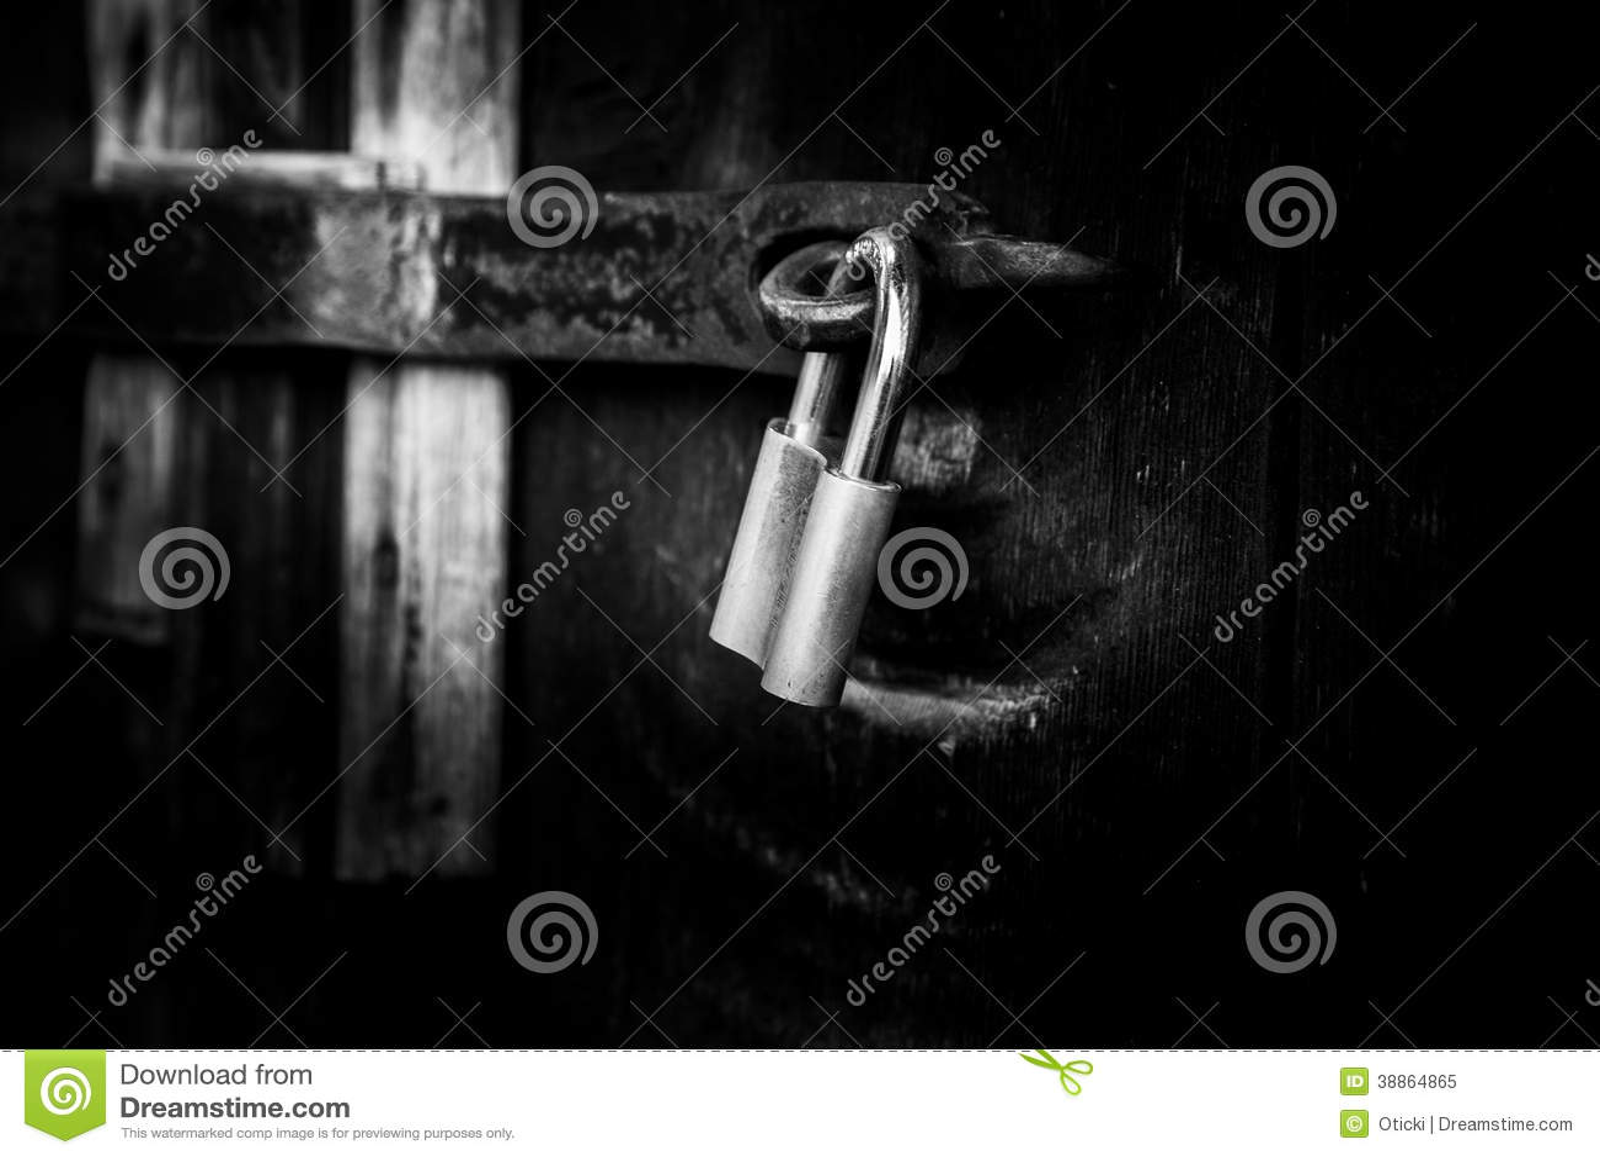 Candado en puerta de madera vieja foto de archivo imagen for Puerta vieja madera